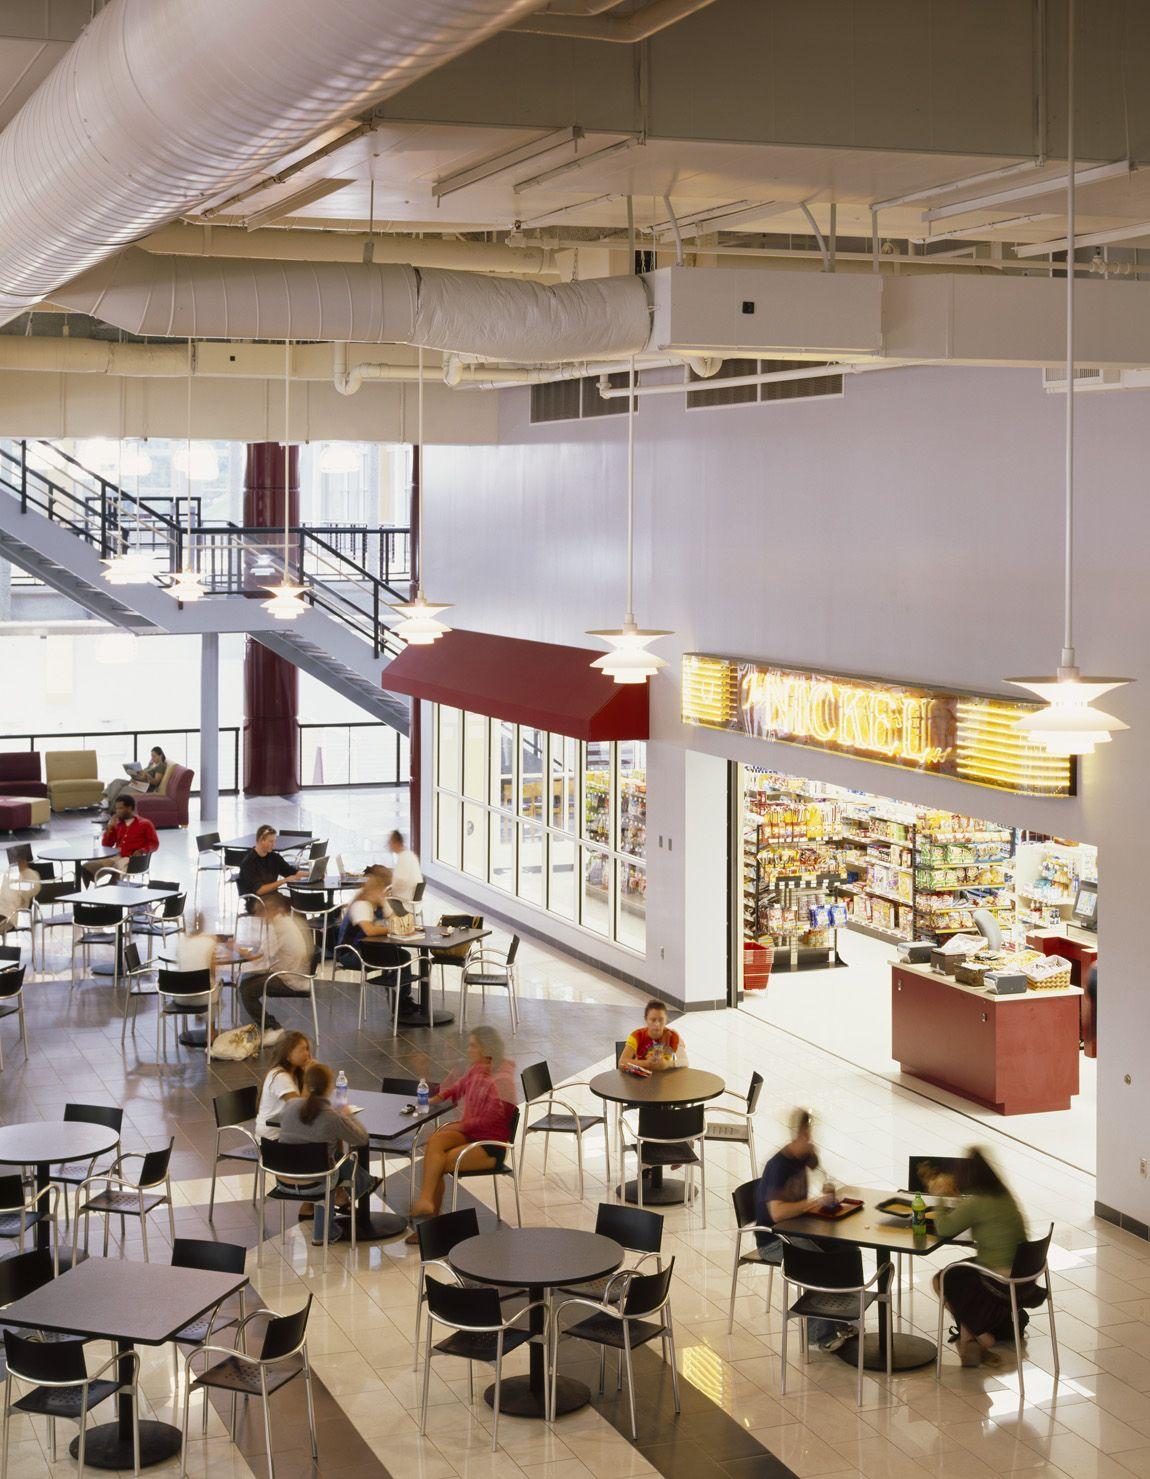 Fairmont State University Student Union And Recreation Center Fairmont Wv Cafeteria Voa